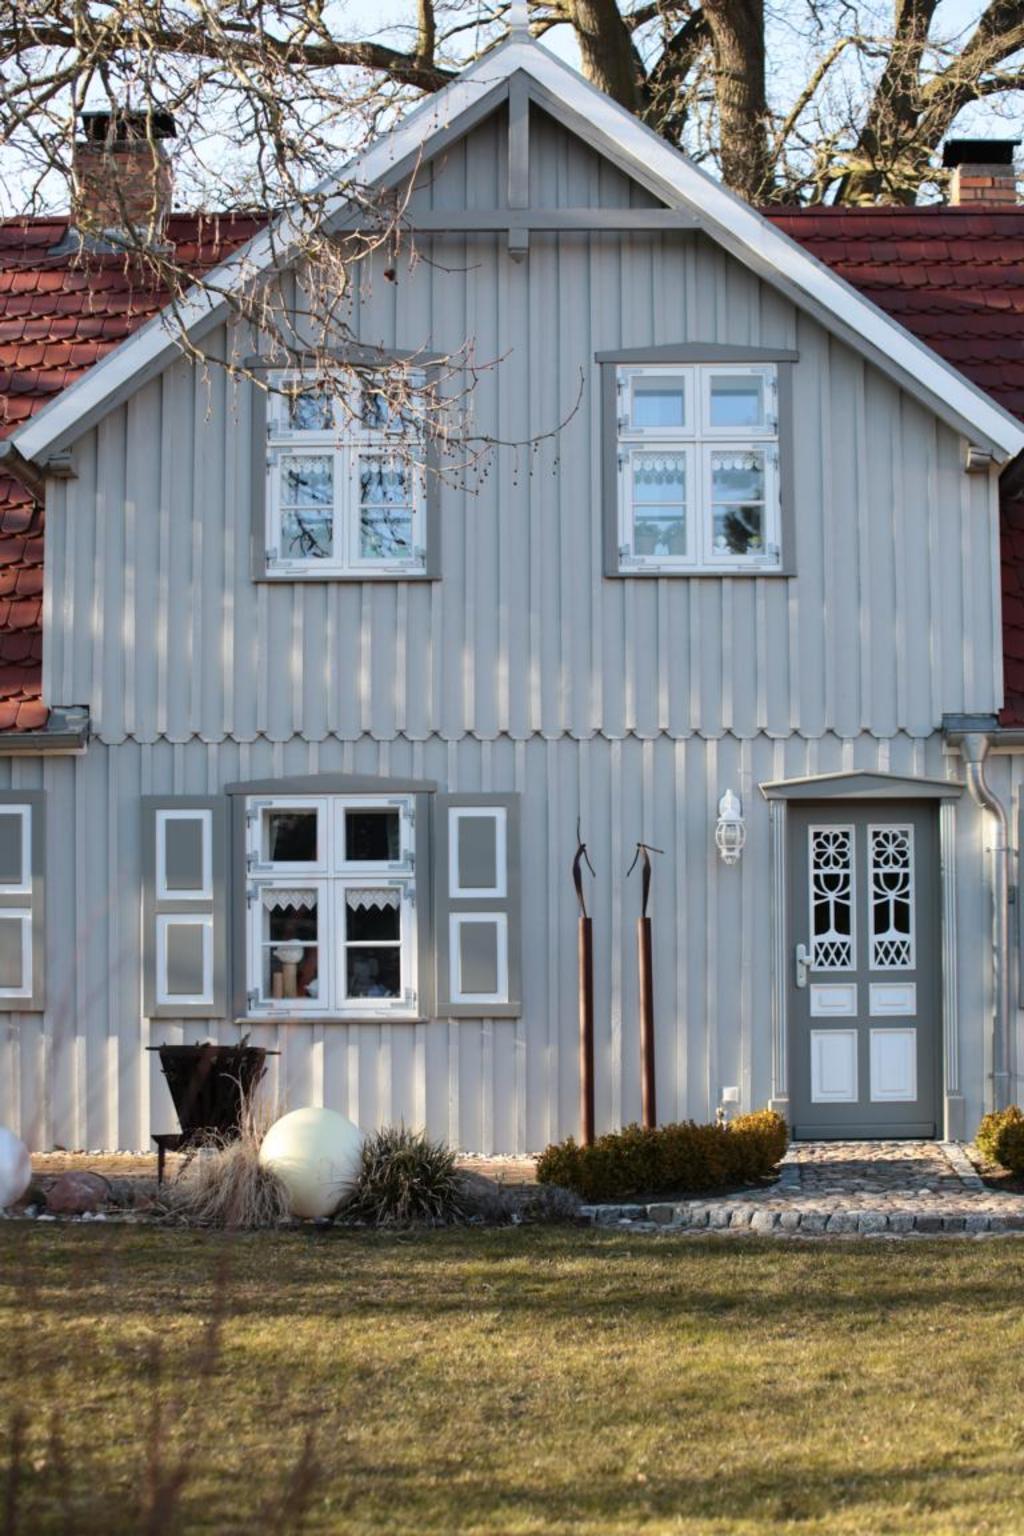 Traumfängerhaus, Engel